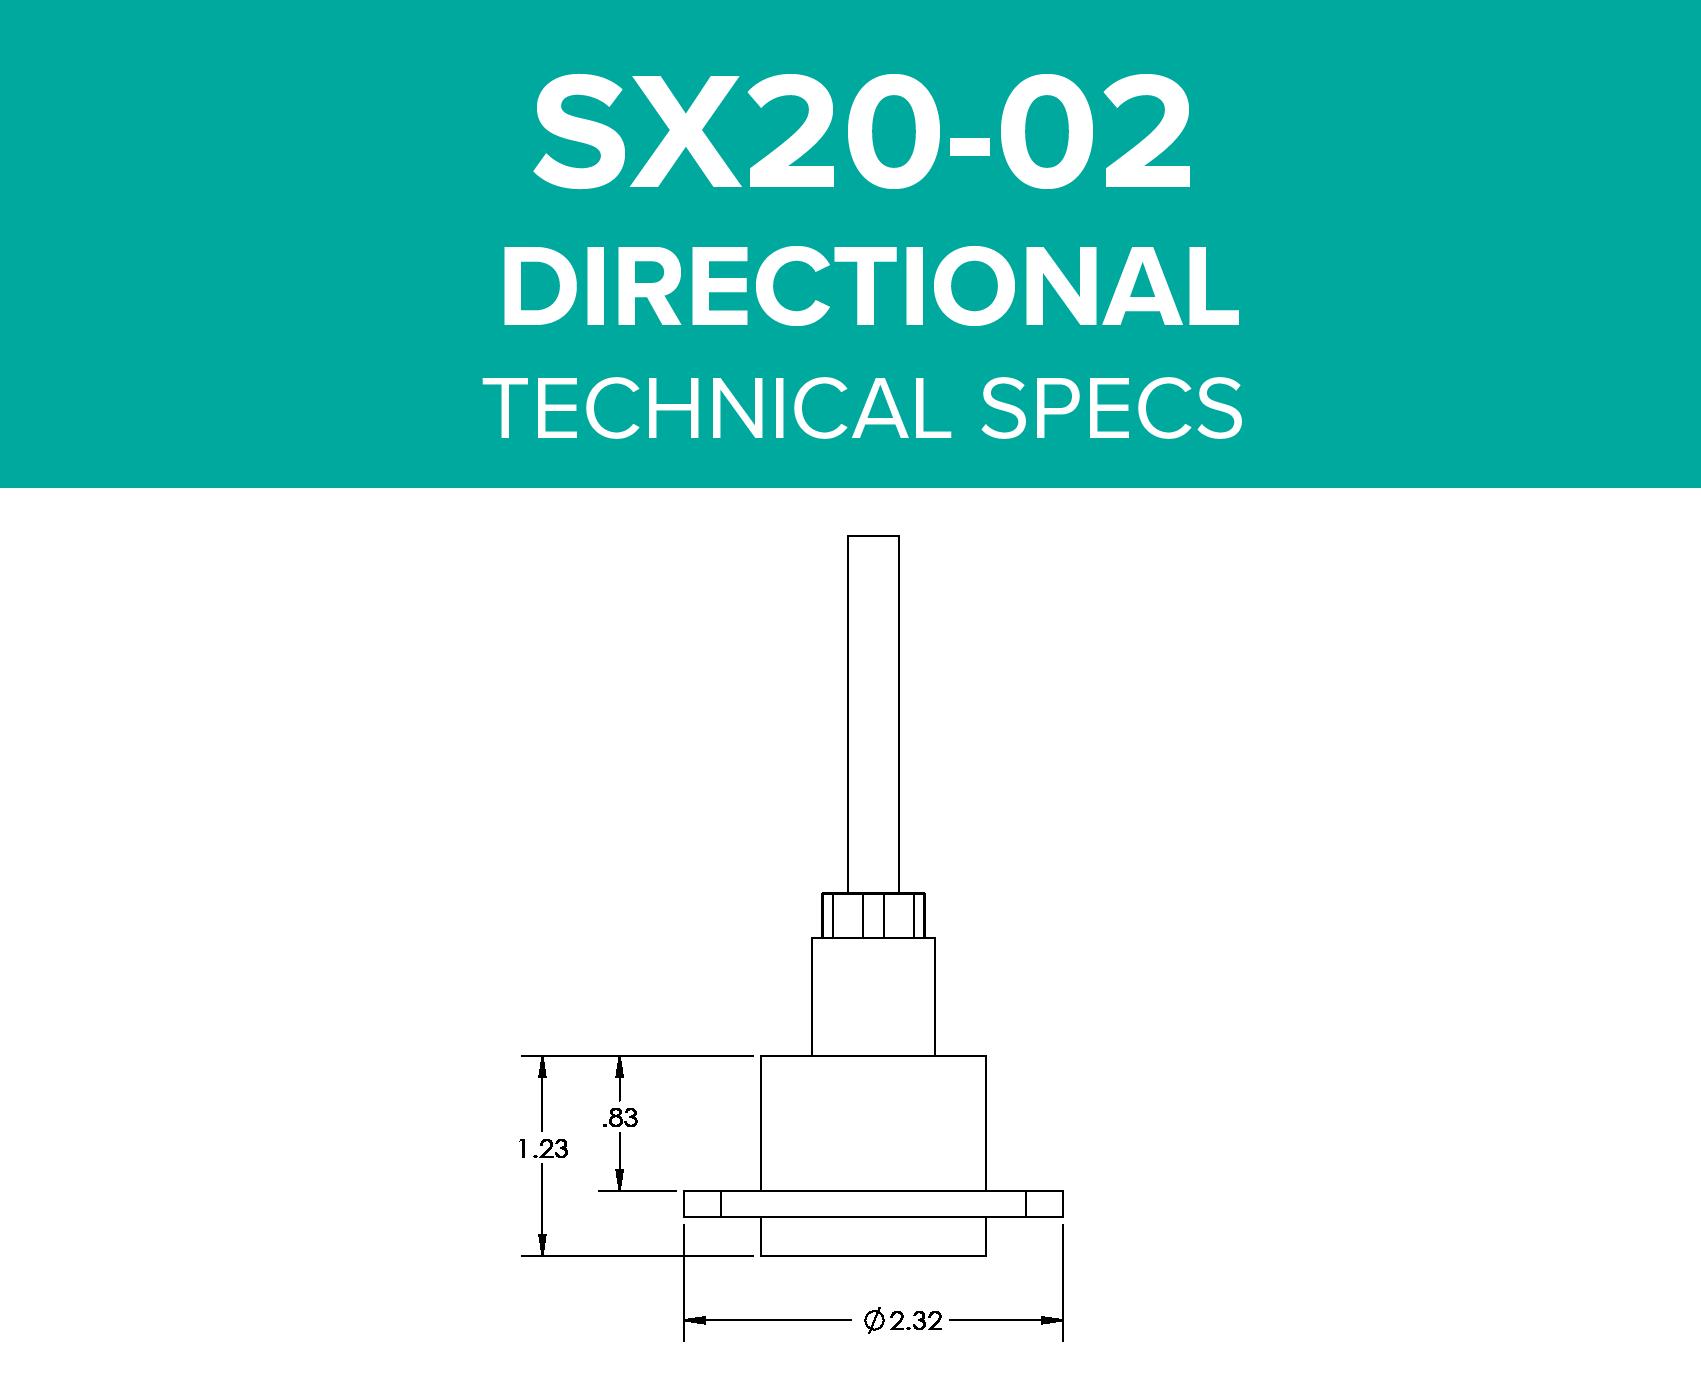 SX20-02